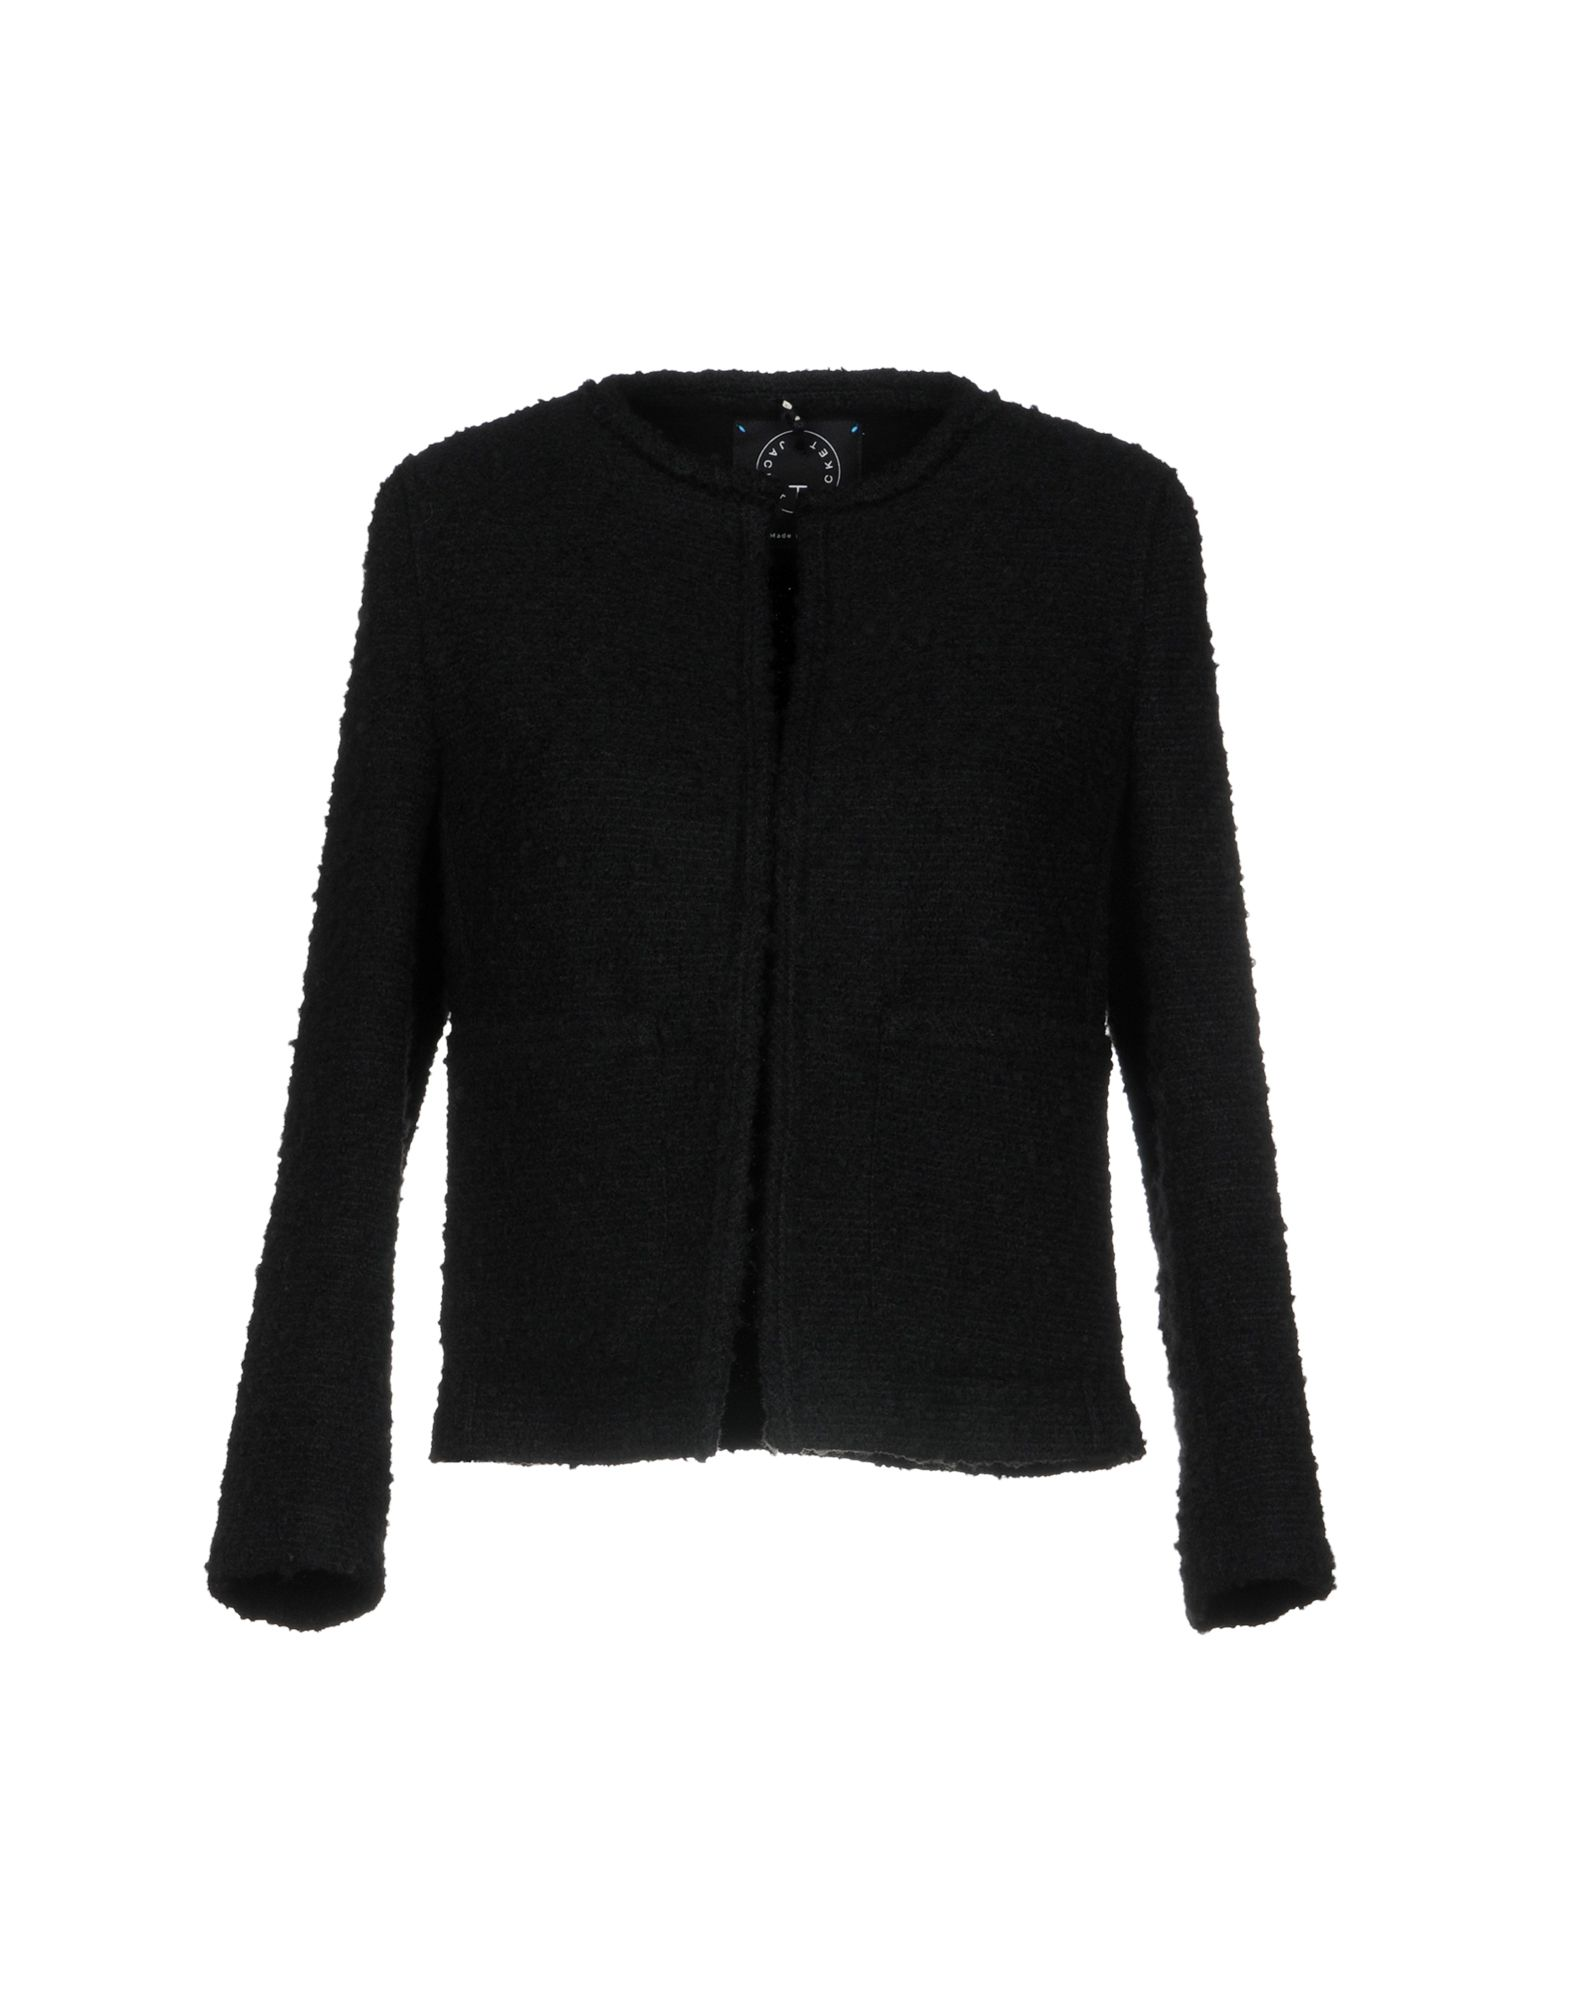 T-JACKET by TONELLO Пиджак fleece lined jacket with epaulet